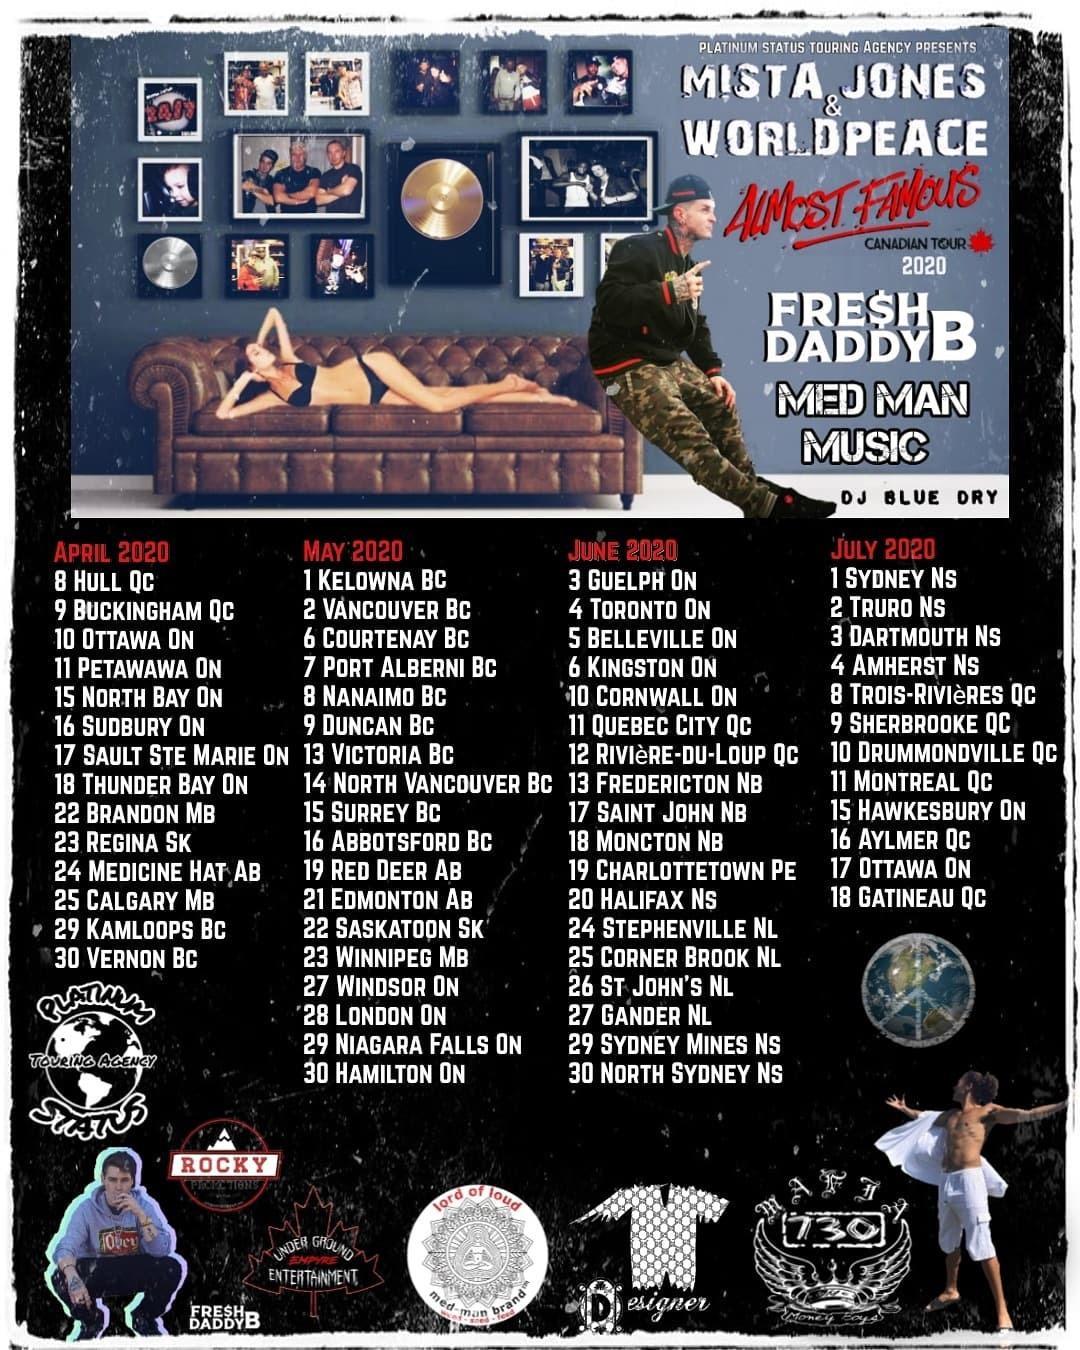 Mista Jones Almost Famous Tour Live In Ottawa, ON 10/4/2020